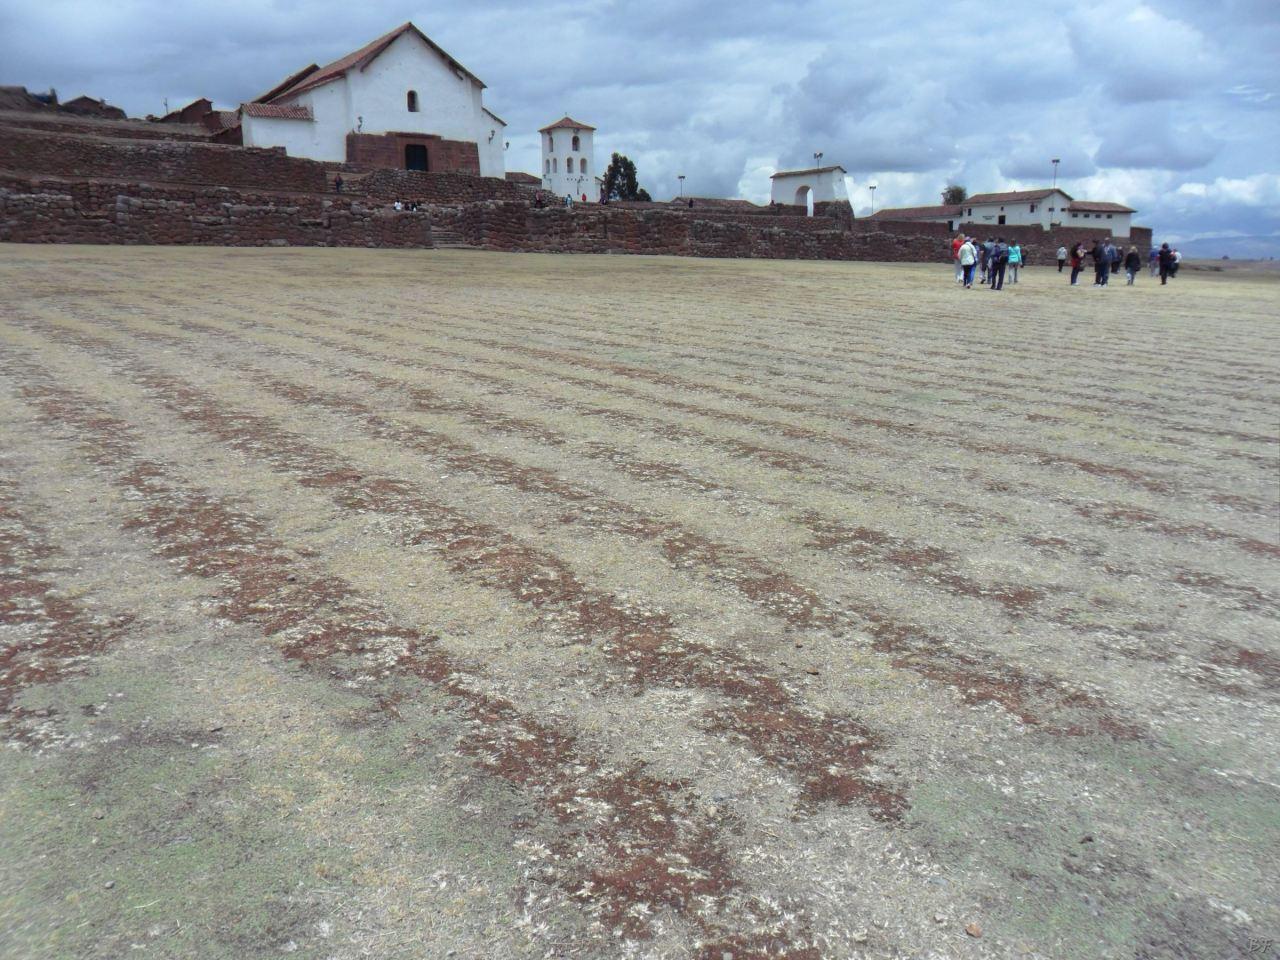 Chinchero-Mura-Poligonali-Piramide-Urubamba-Peru-2